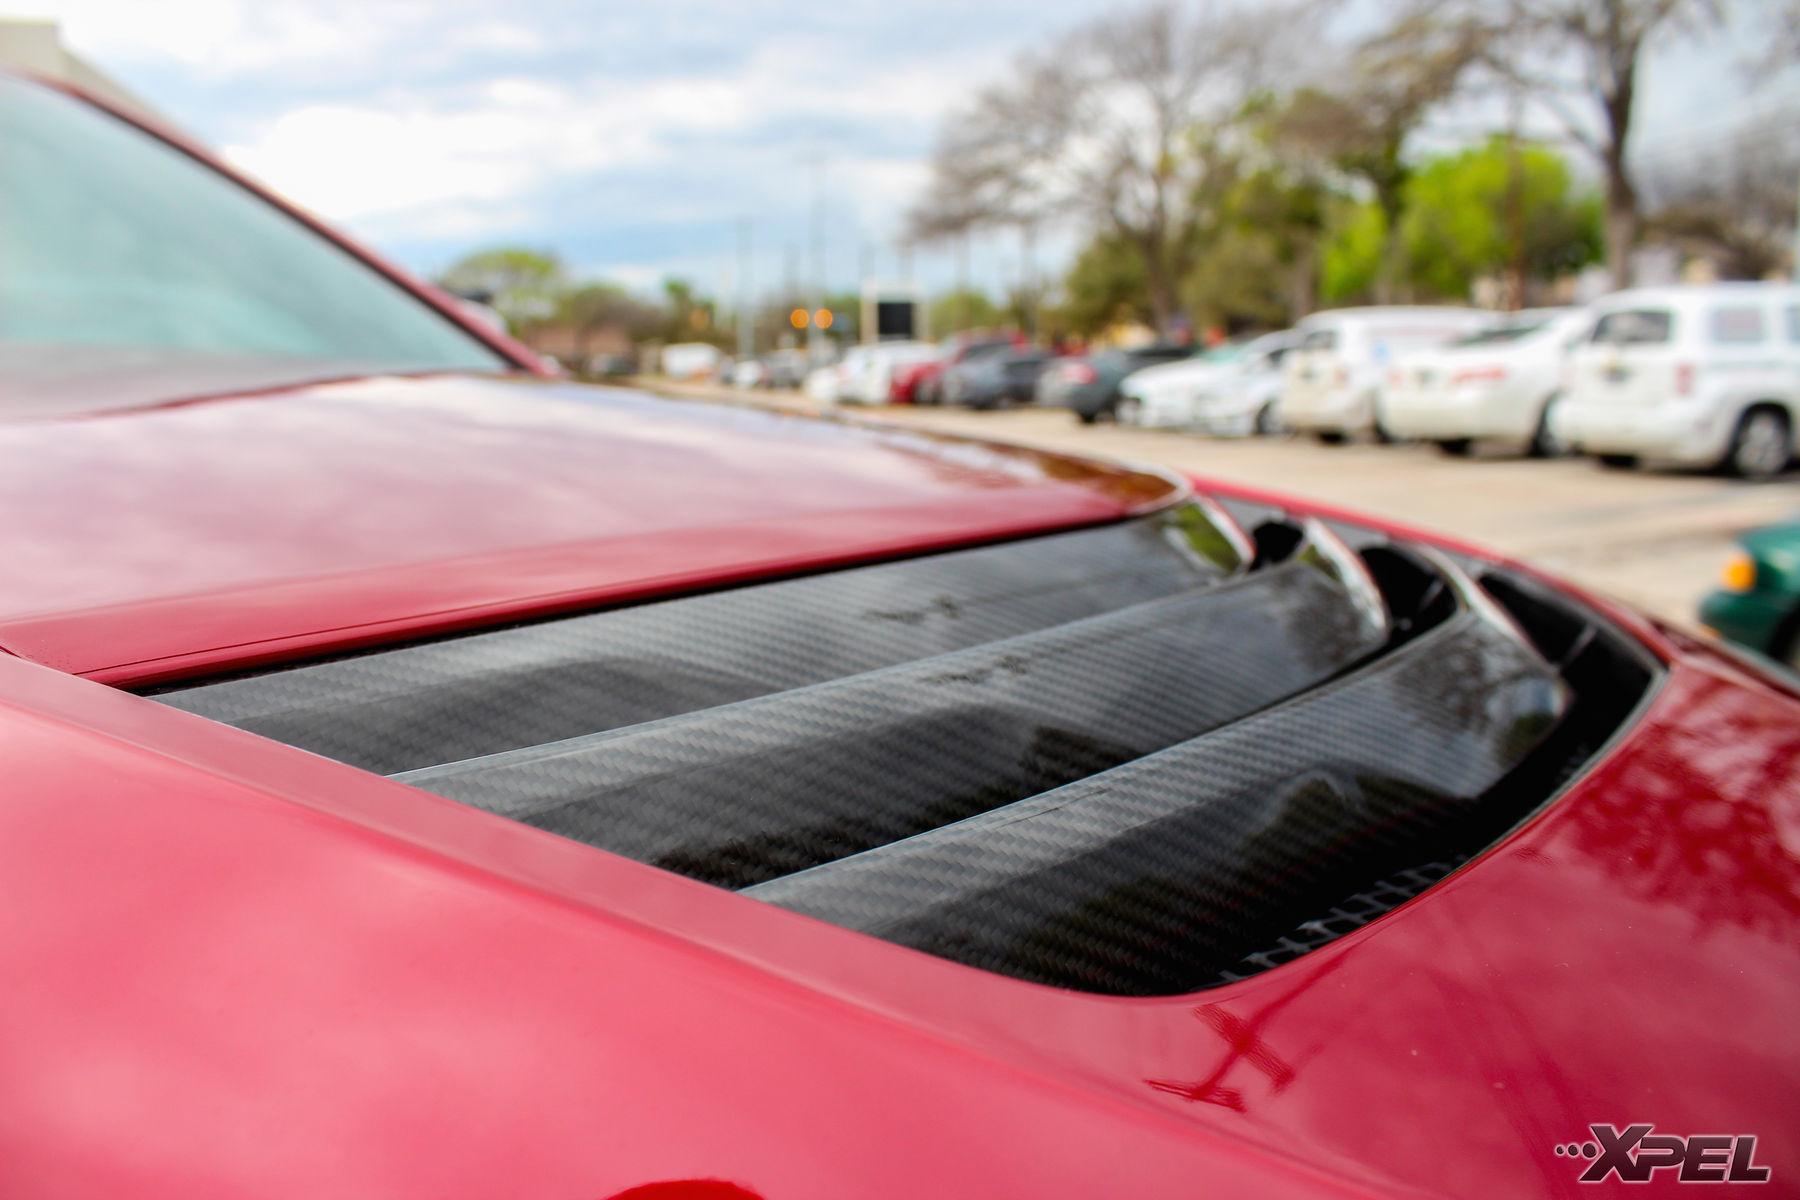 2016 Cadillac CTS-V   Red 2016 Cadillac CTS-V